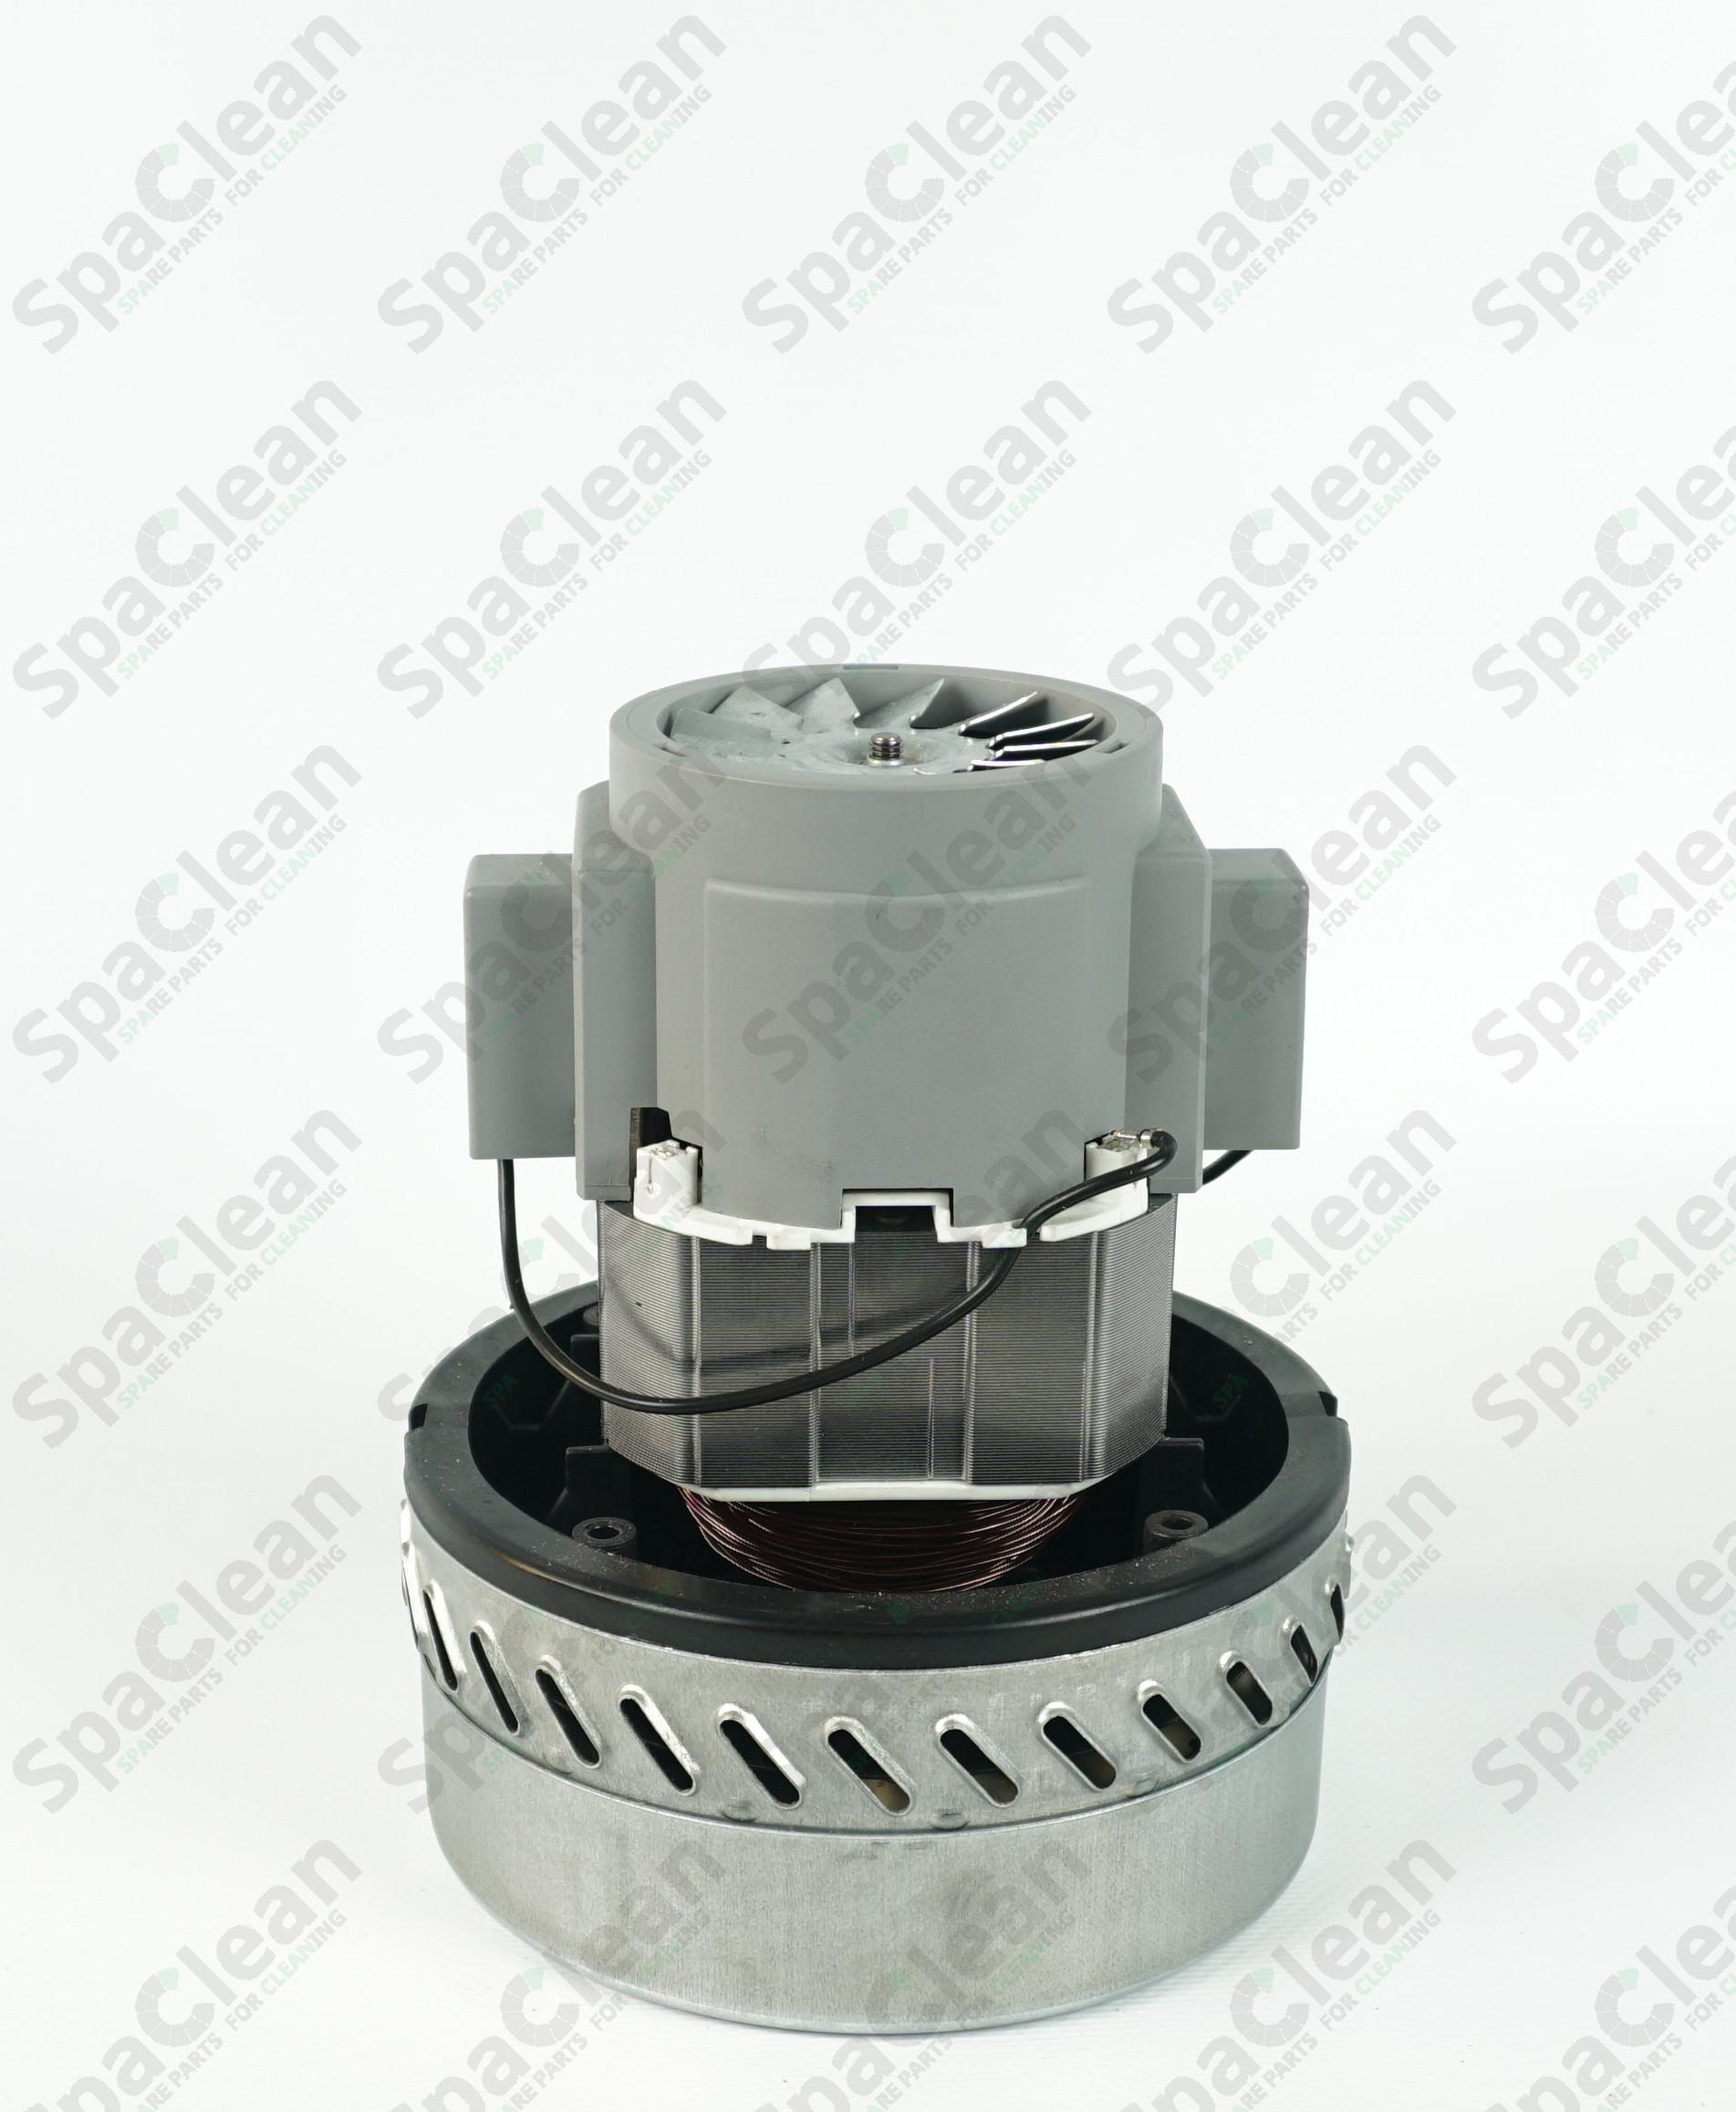 Вакуумный мотор Ametek 230V 1200W Двухстадийный для Nilfisk Alto SQ 550-11